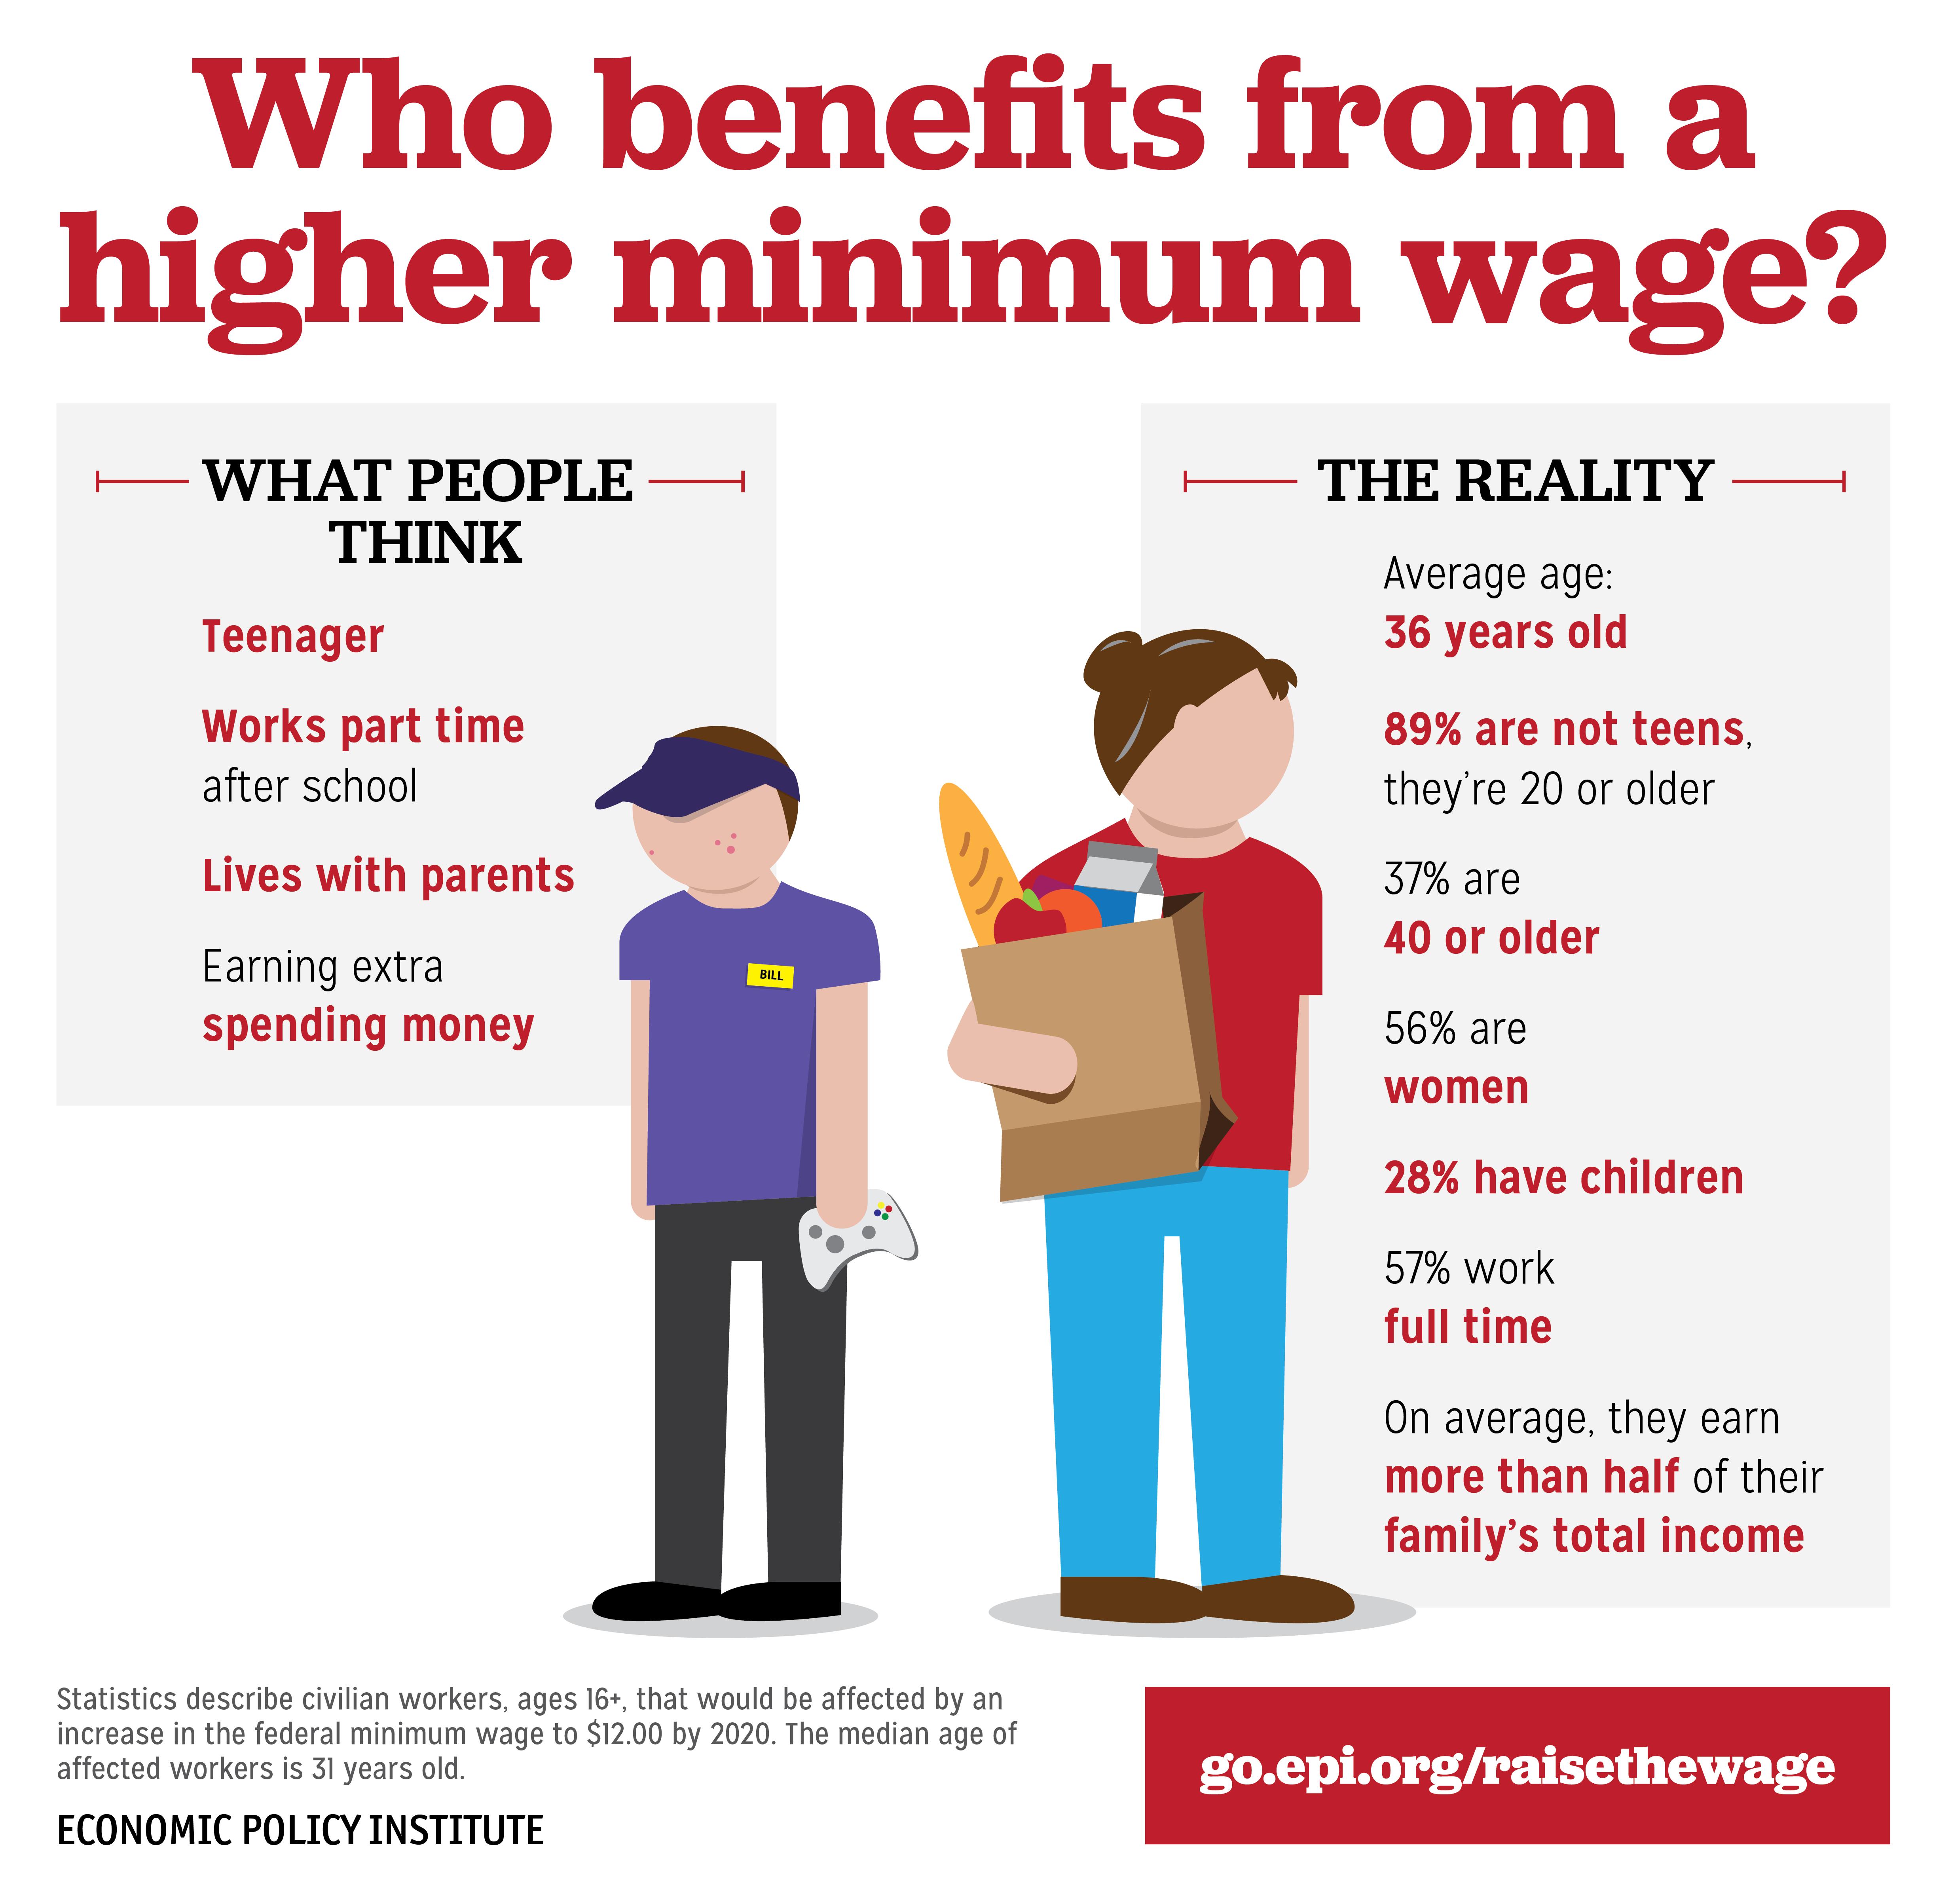 018 Minimum Wage Essay Example Low Snapshot Updated 2015 1 Impressive Persuasive Topics Contest Outline Full